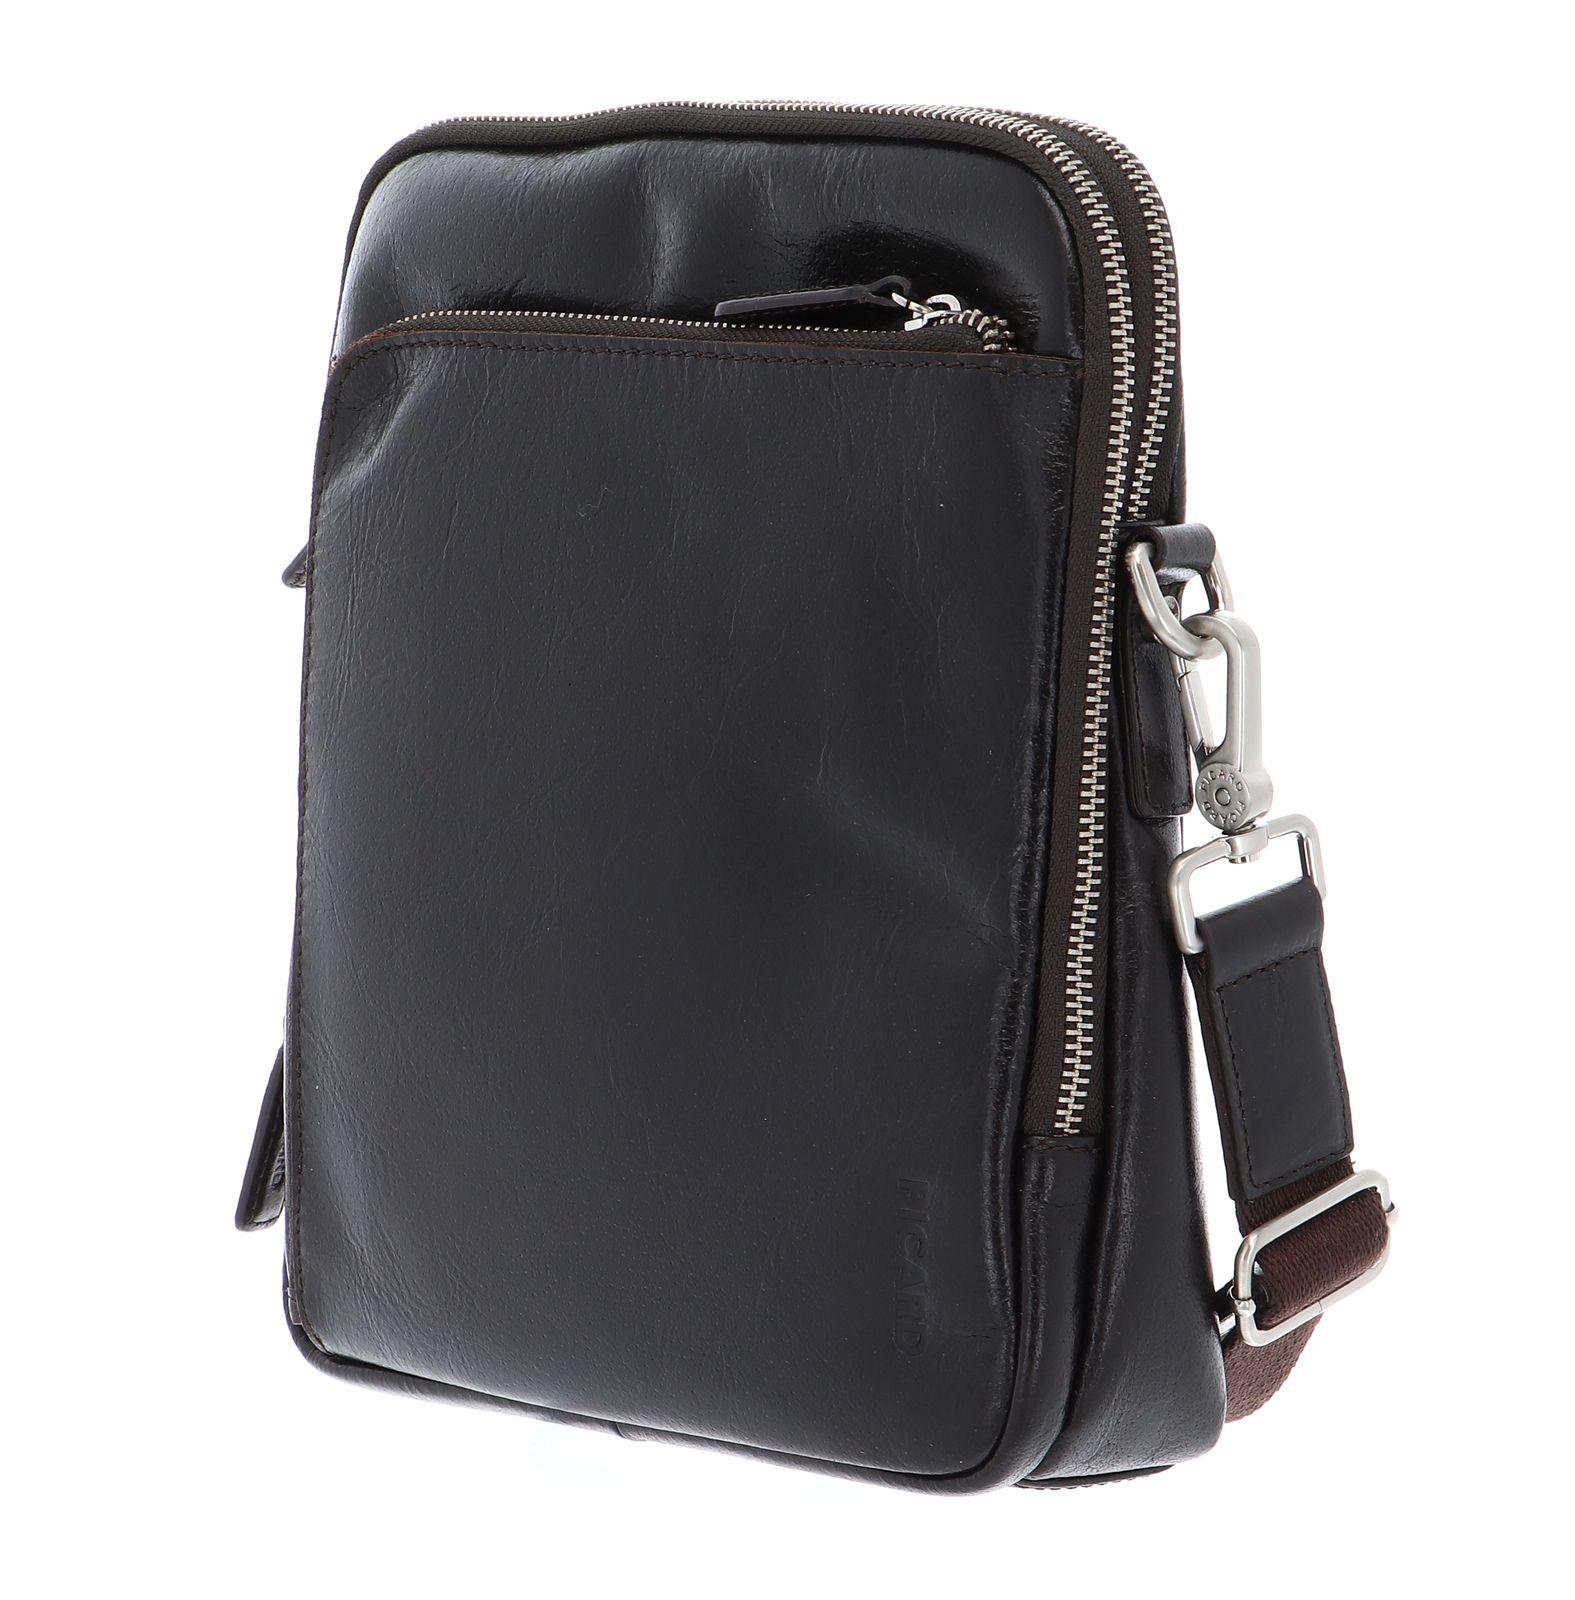 PICARD Buddy Messenger Bag Cafe